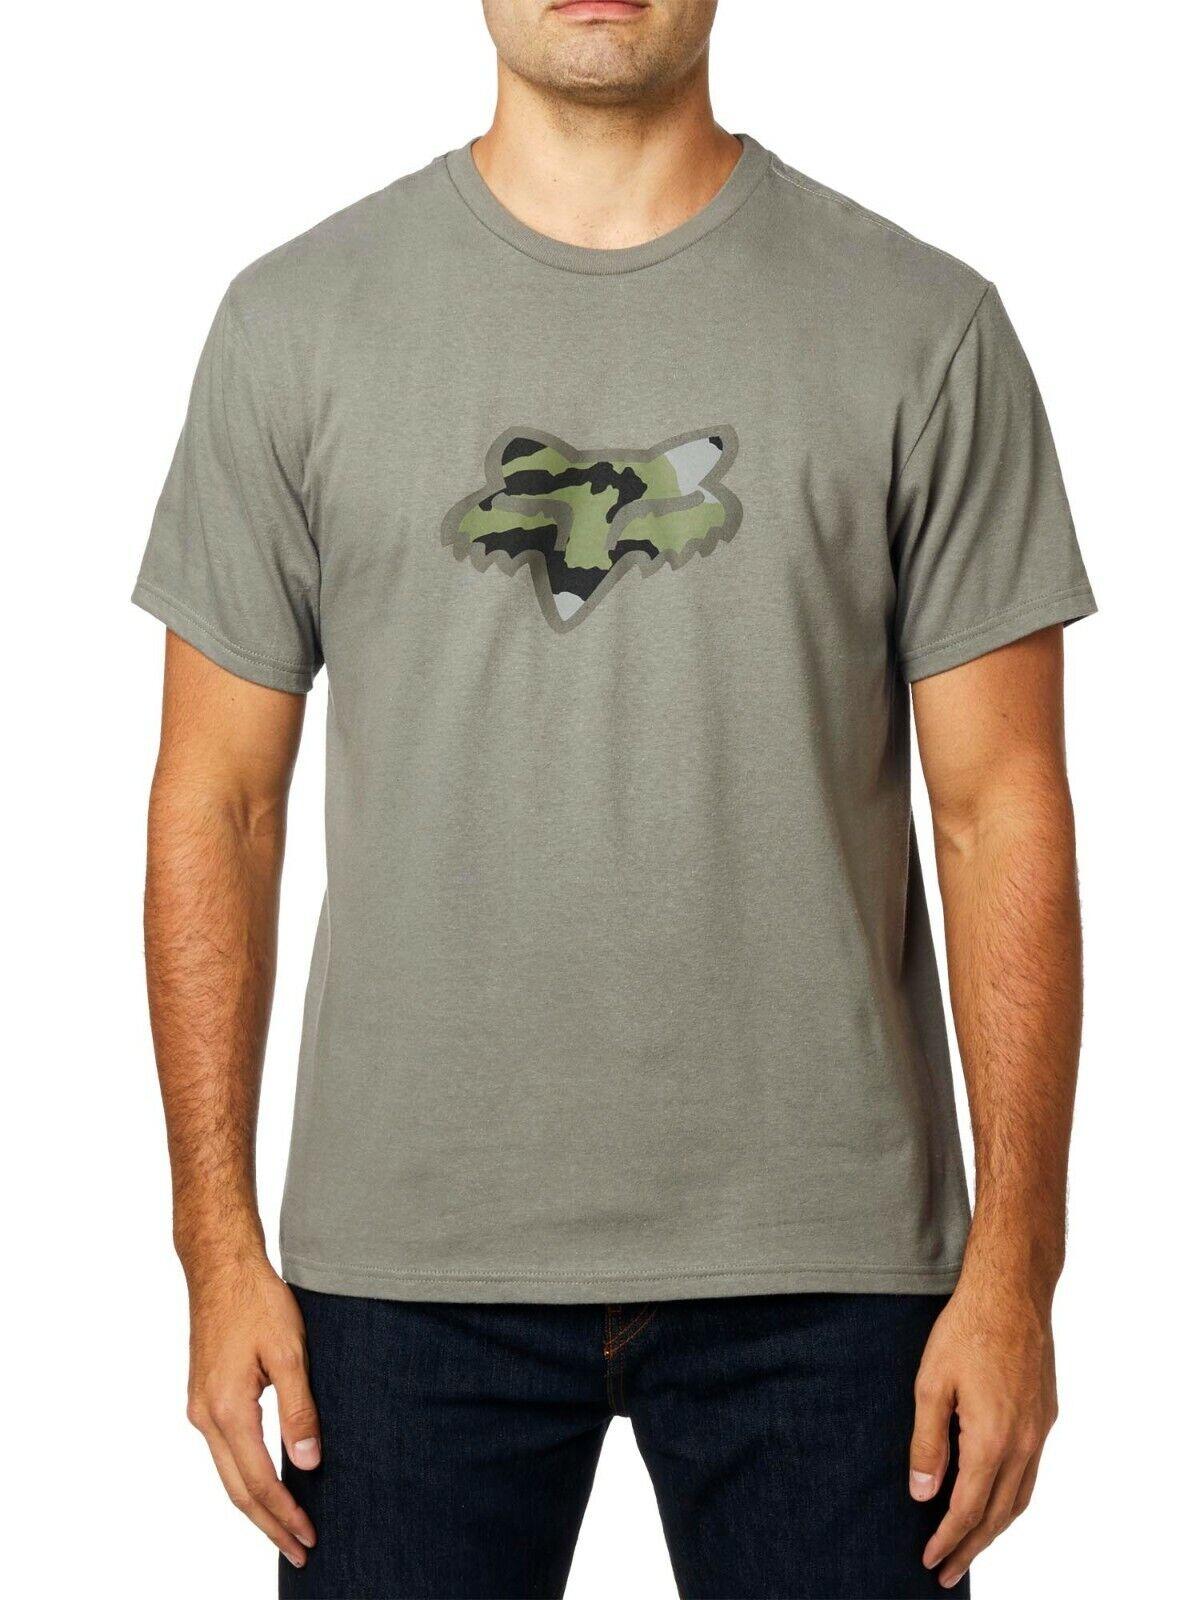 Fox Racing Men's Predator Short Sleeve T-shirt Foxhead Camo